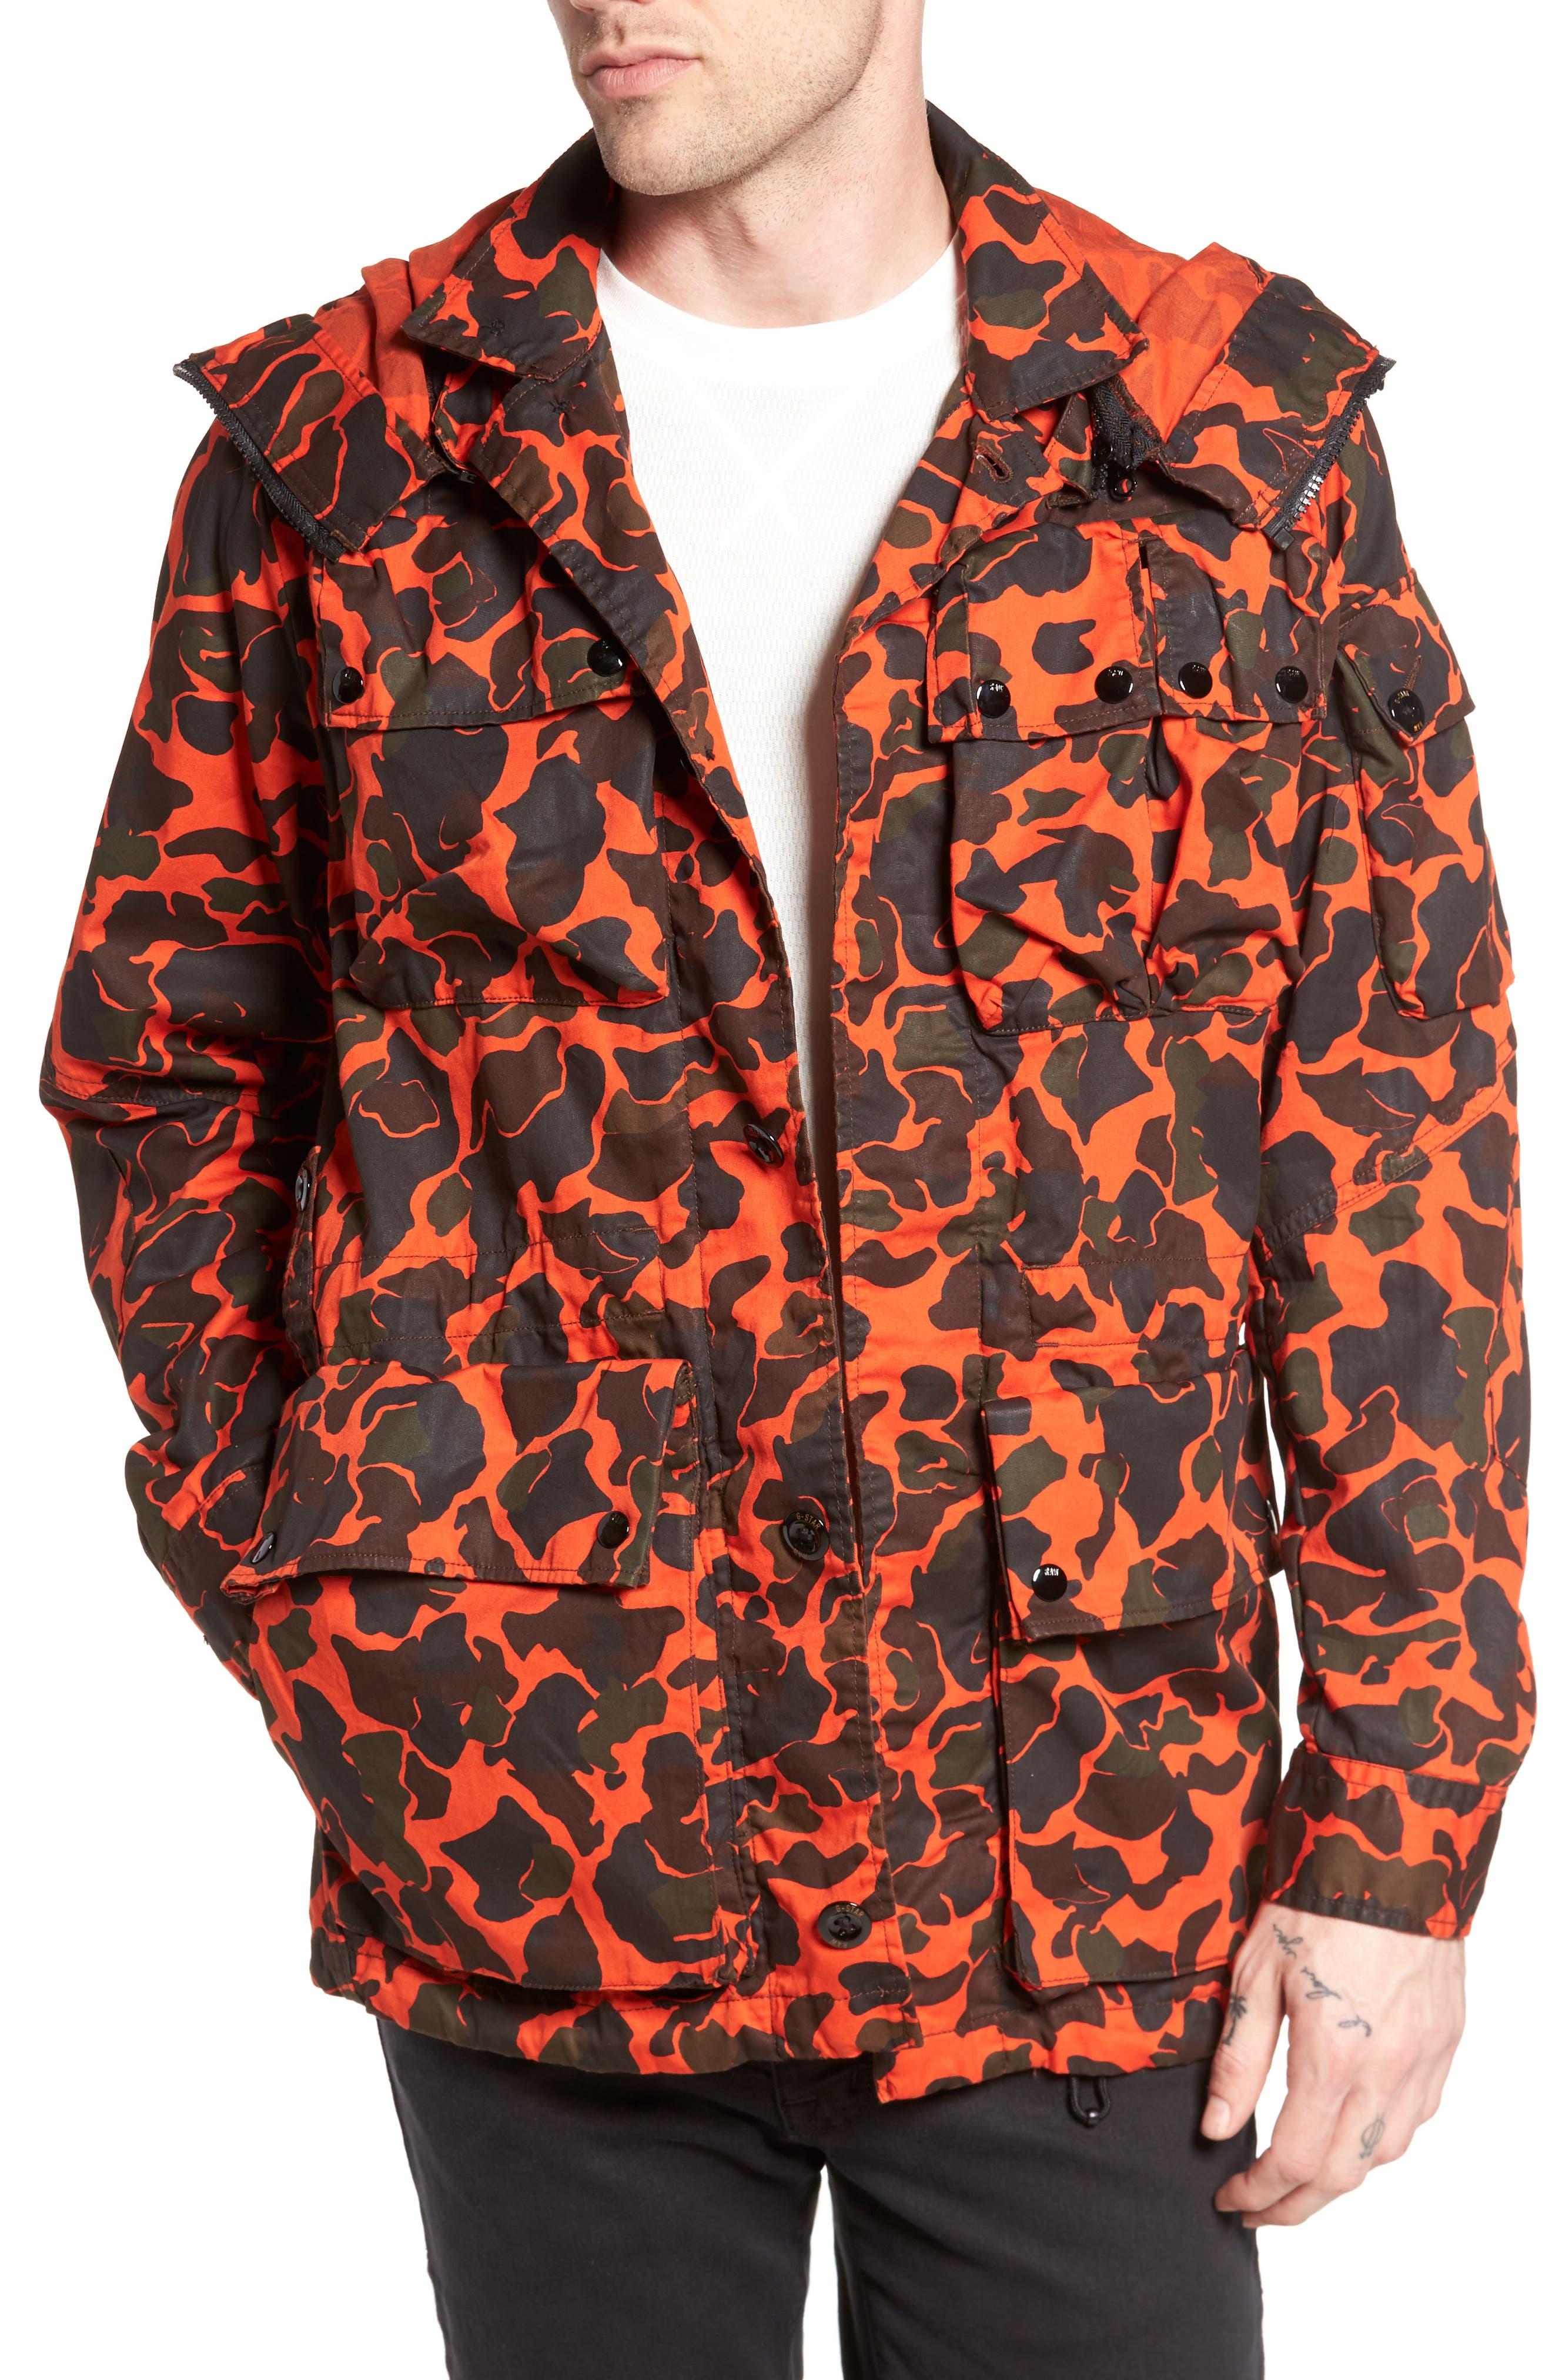 G-Star Raw Ospak Submarine Hooded Jacket